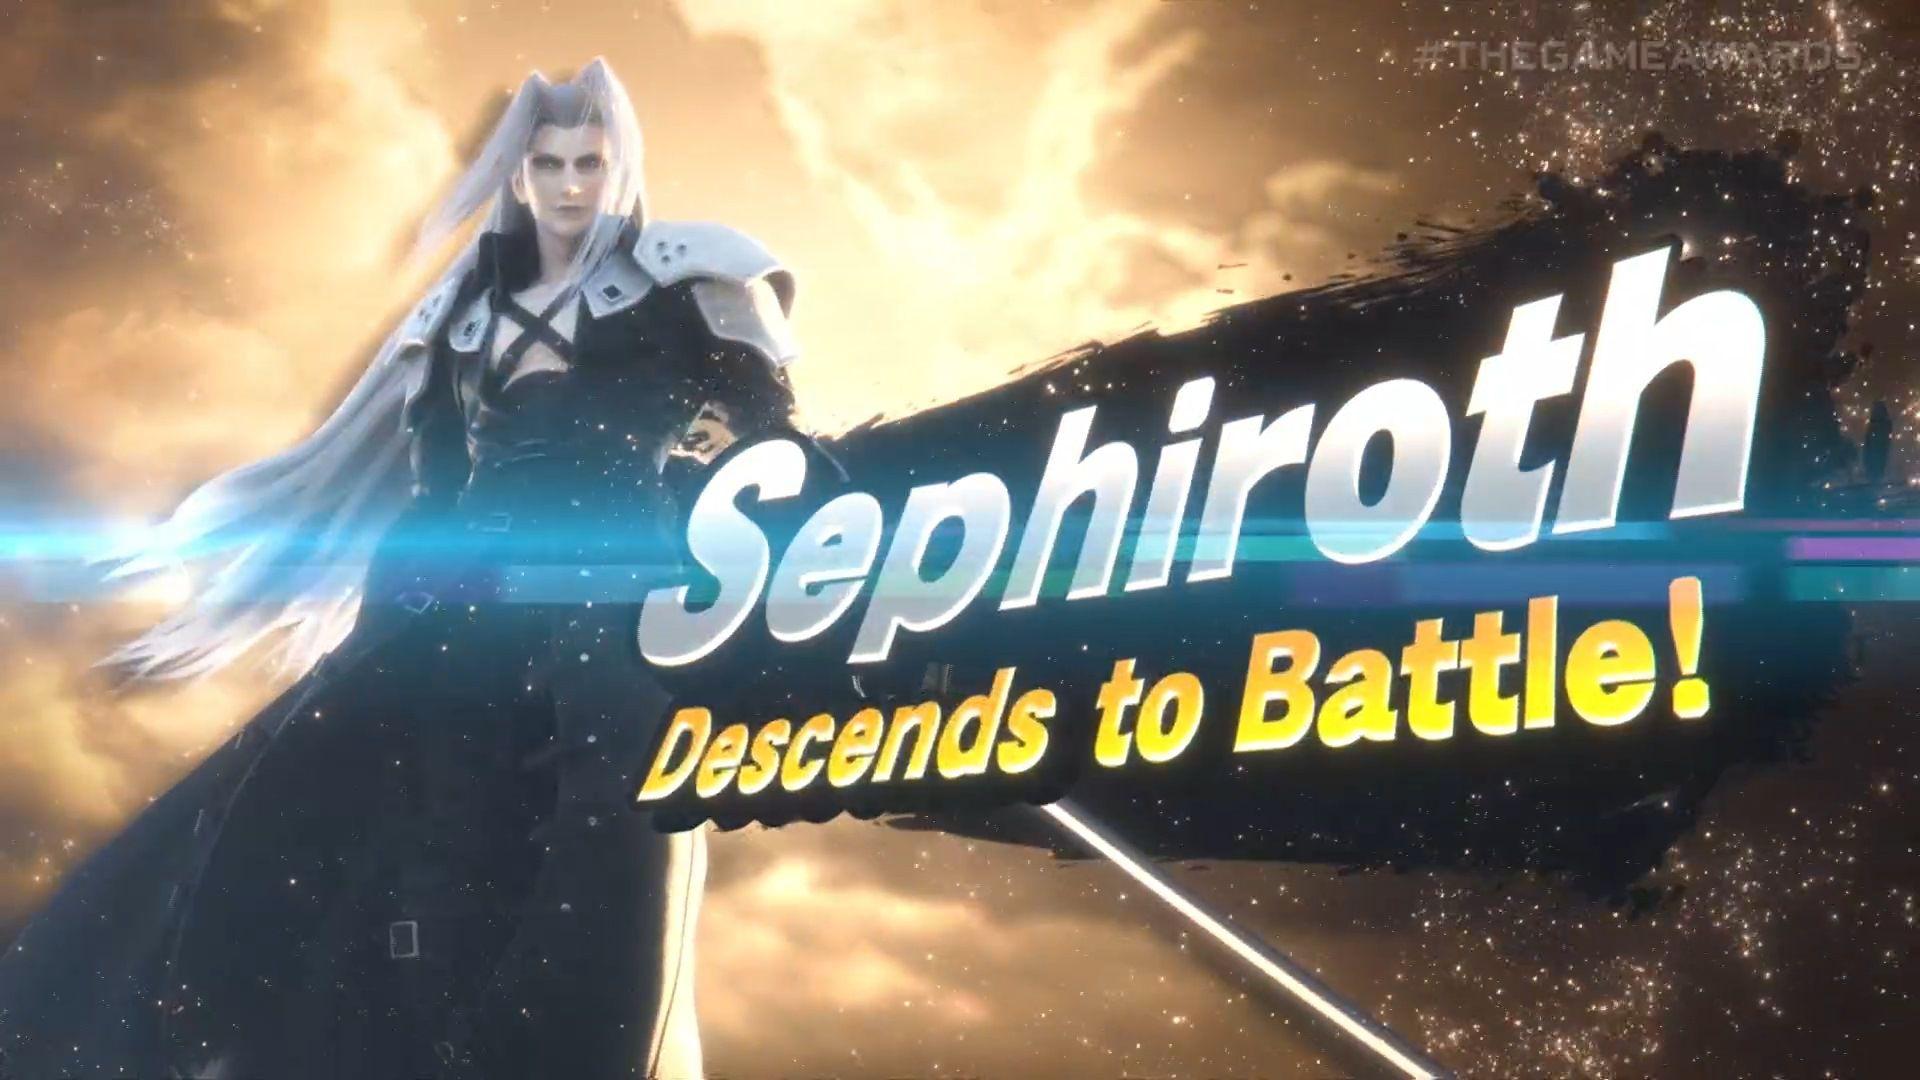 Sepiroth